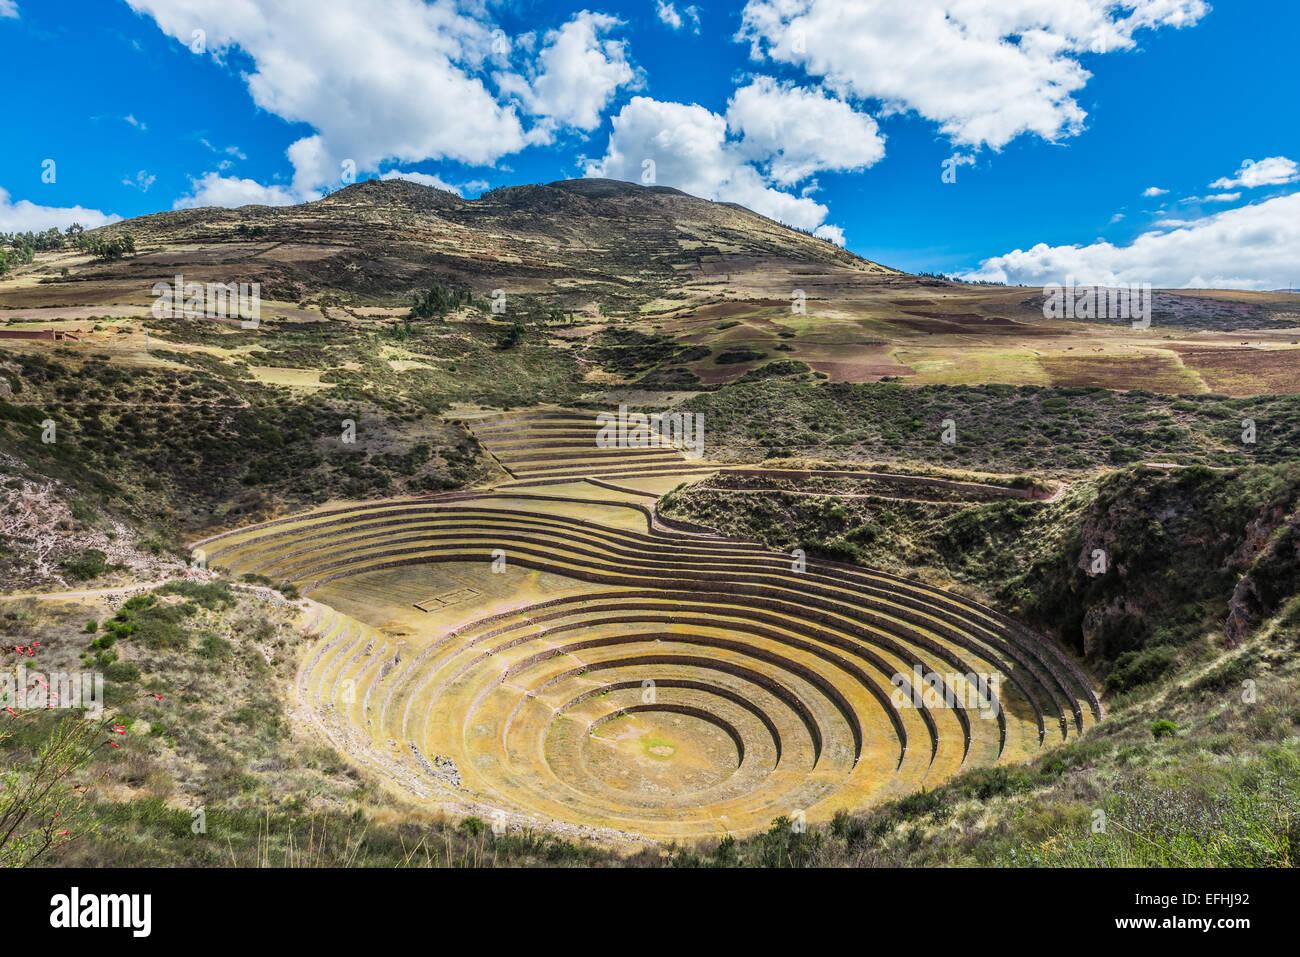 Moray, Incas ruins in the peruvian Andes at Cuzco Peru - Stock Image